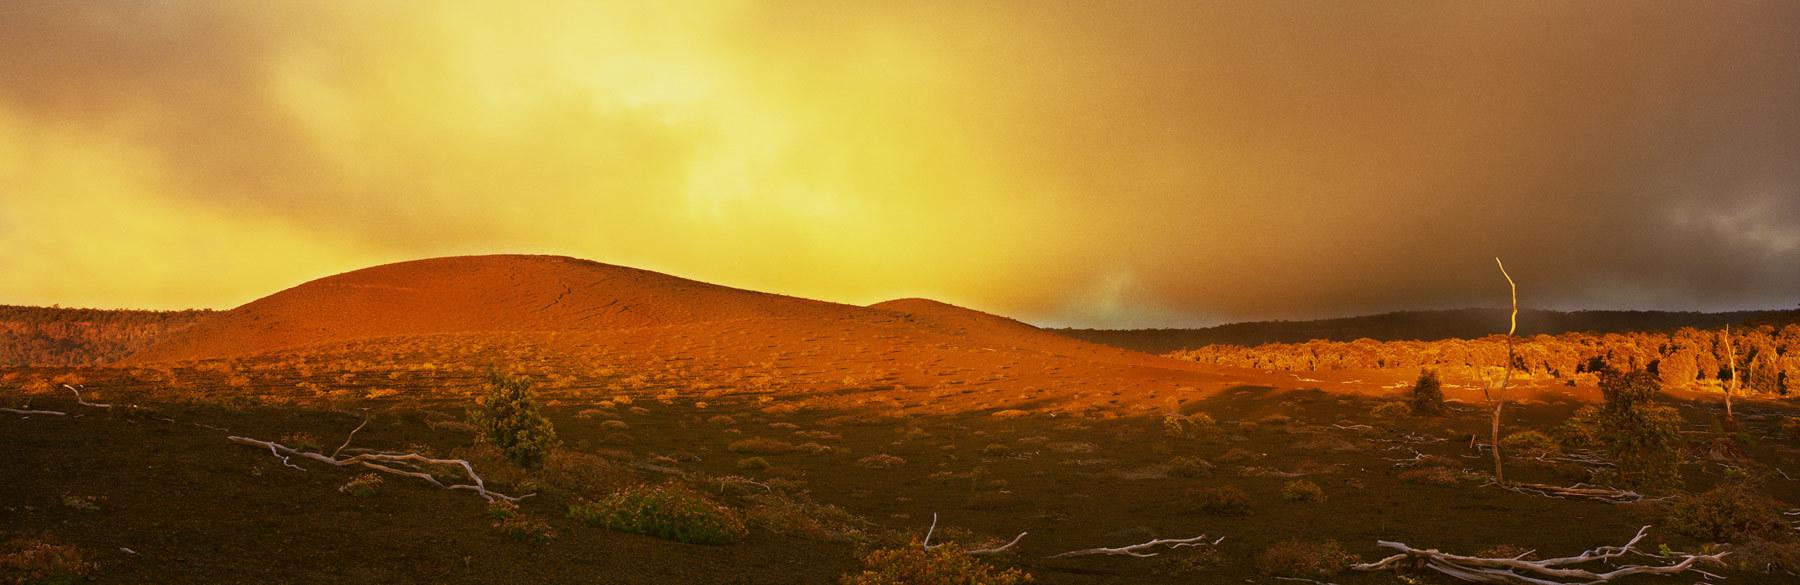 Lightbox_jorstad_hawaii_volcanoes_guywhu